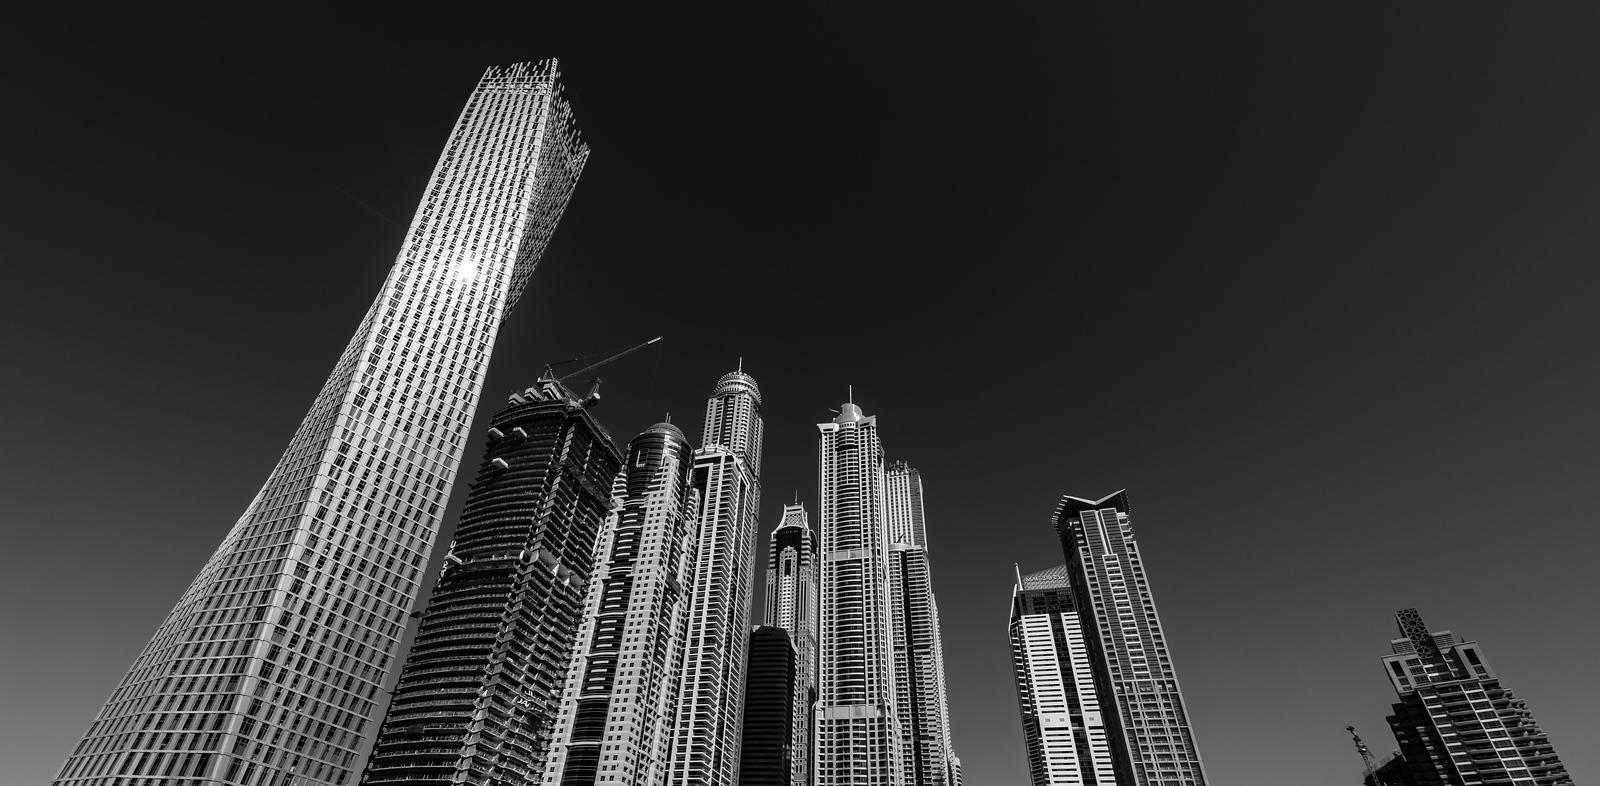 Dubai Marina's impressive skyscrapers...